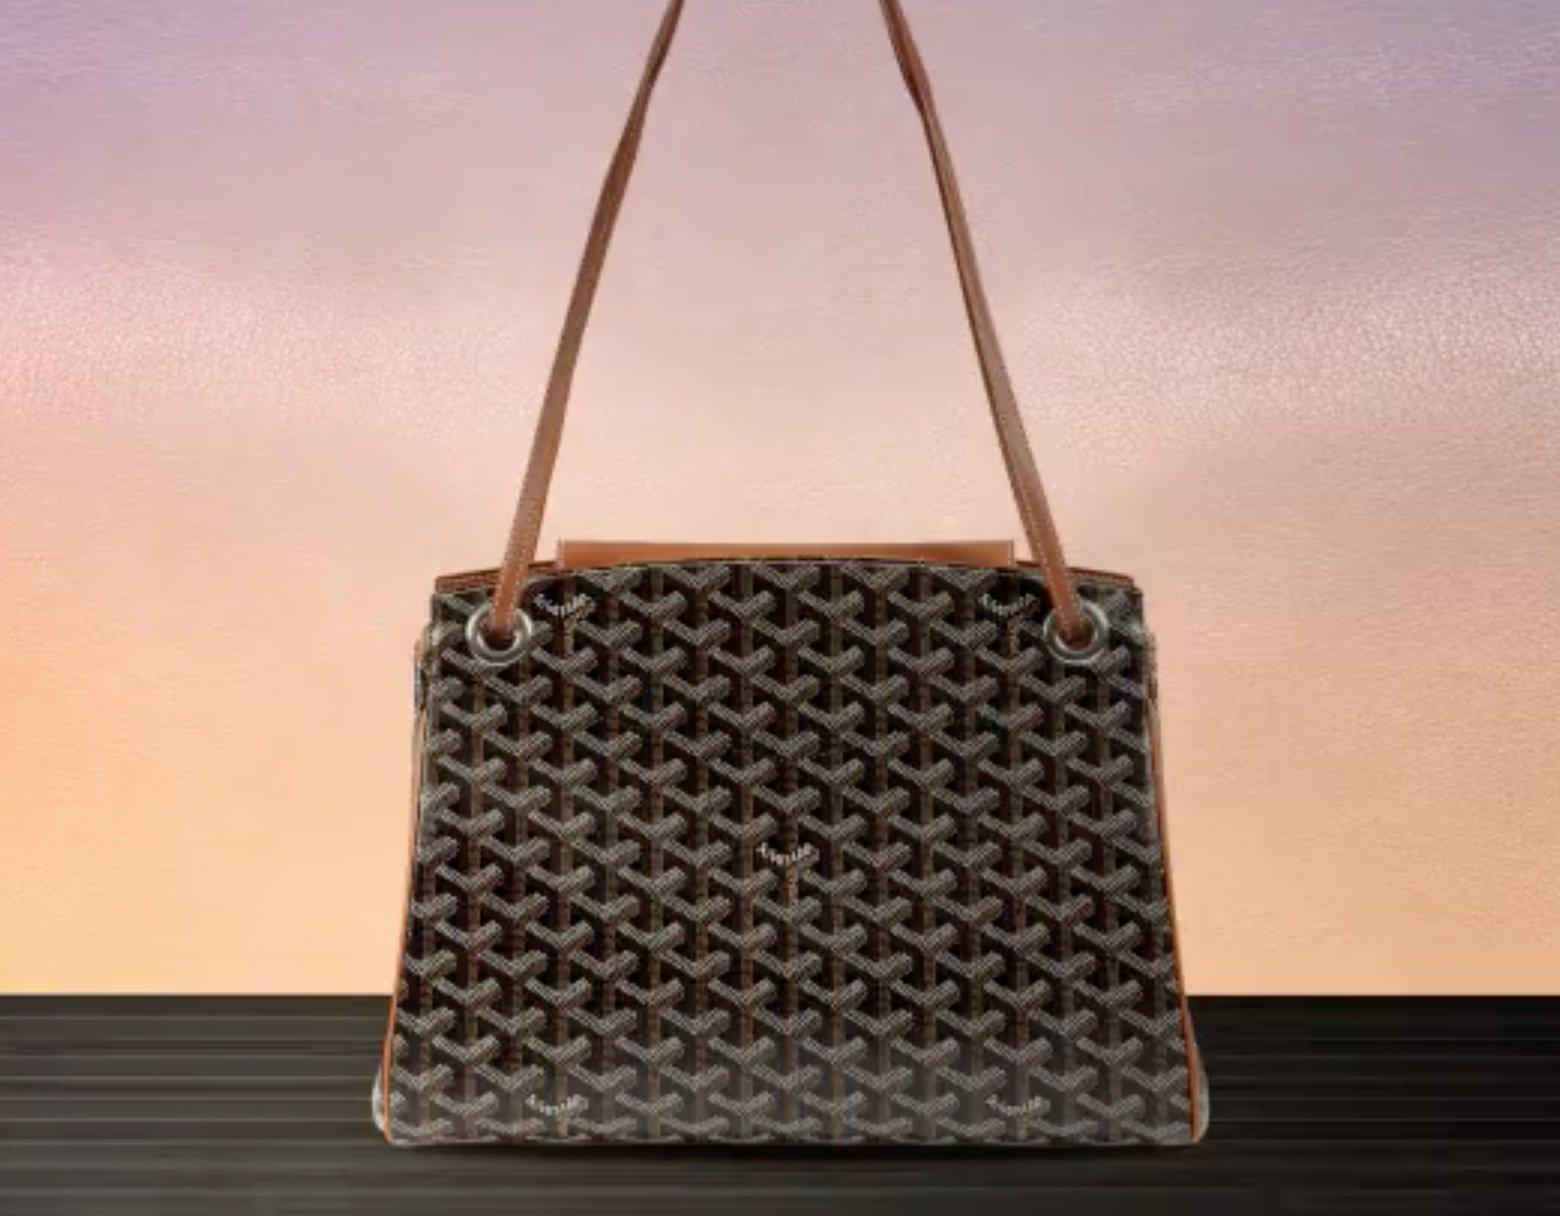 Goyard Rouette Soft Bag